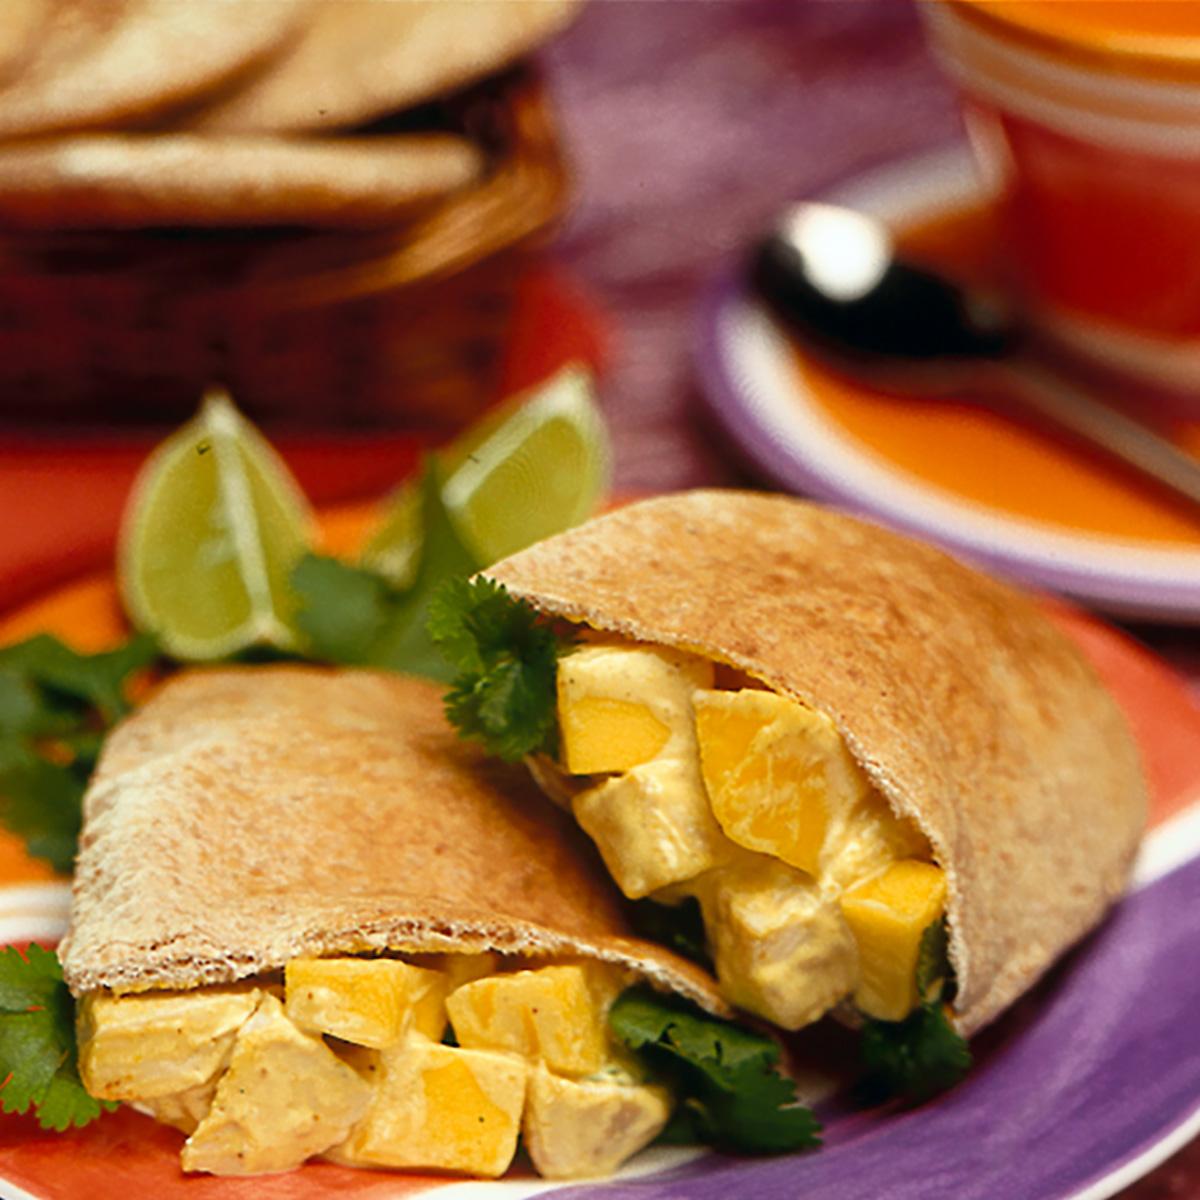 Eghoyans Food Photography